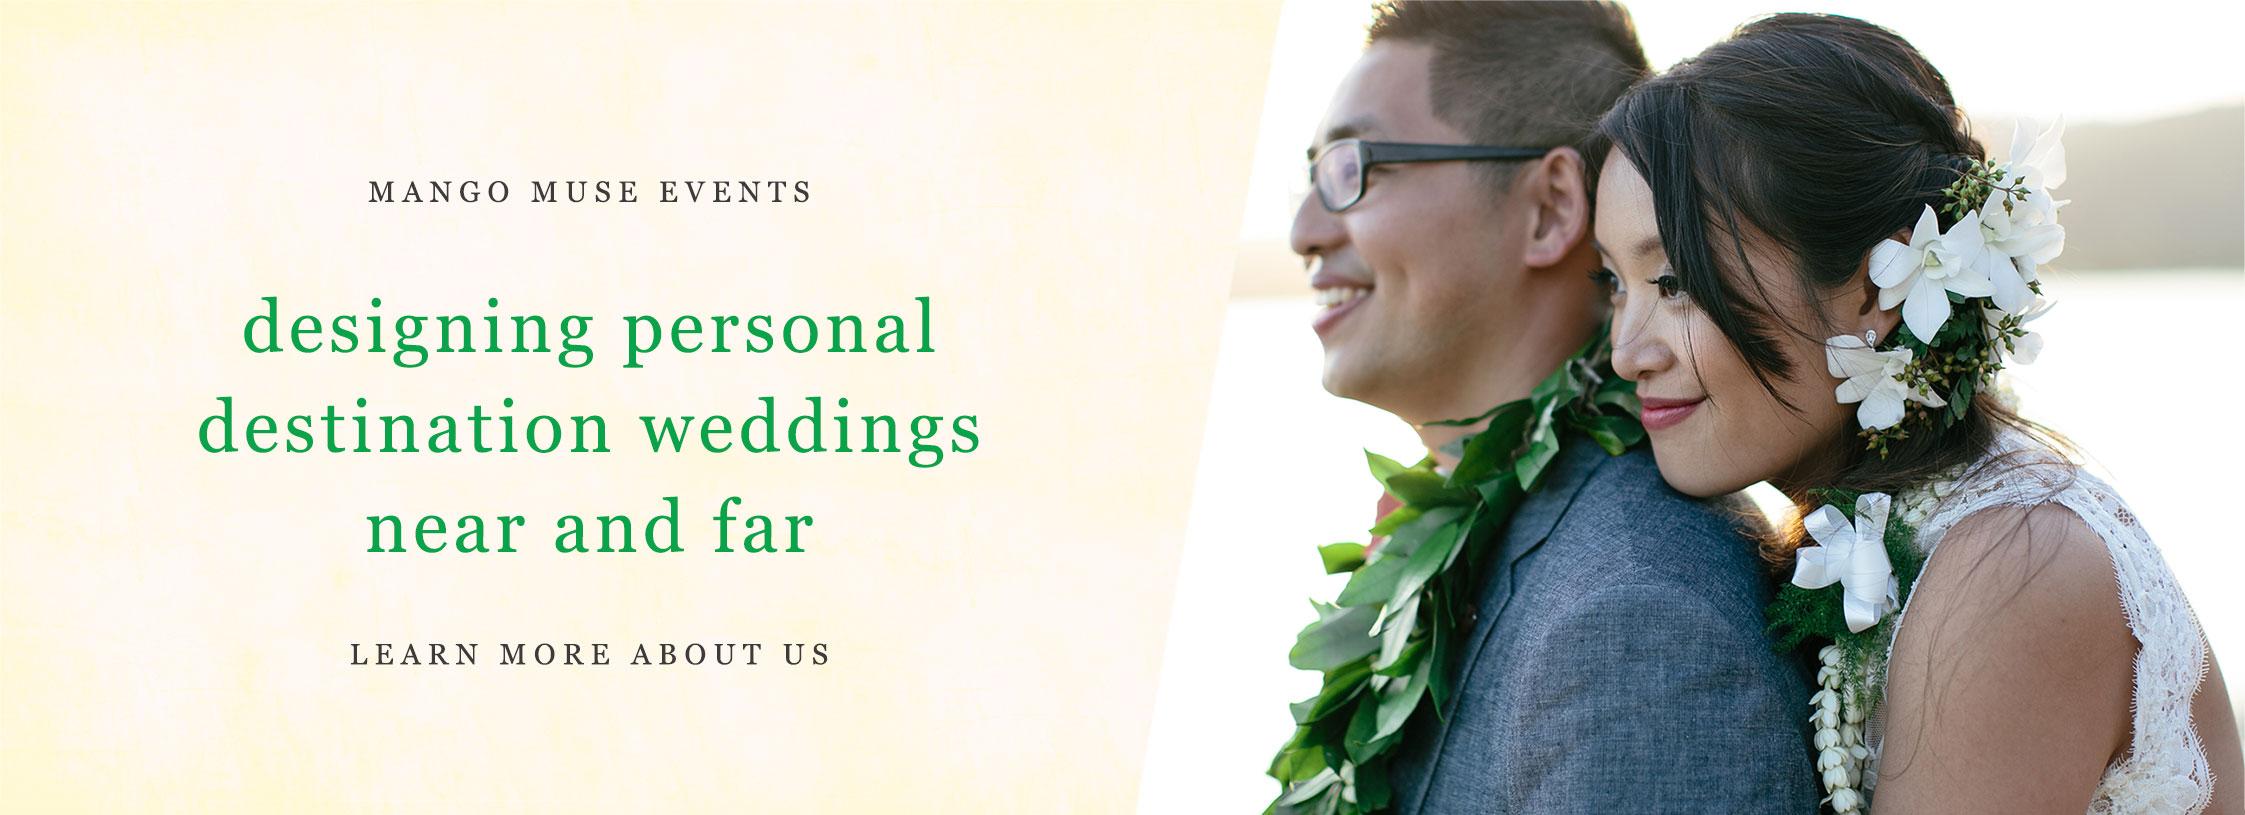 Happy couple at a Hawaii destination wedding by Destination wedding planner Mango Muse Events